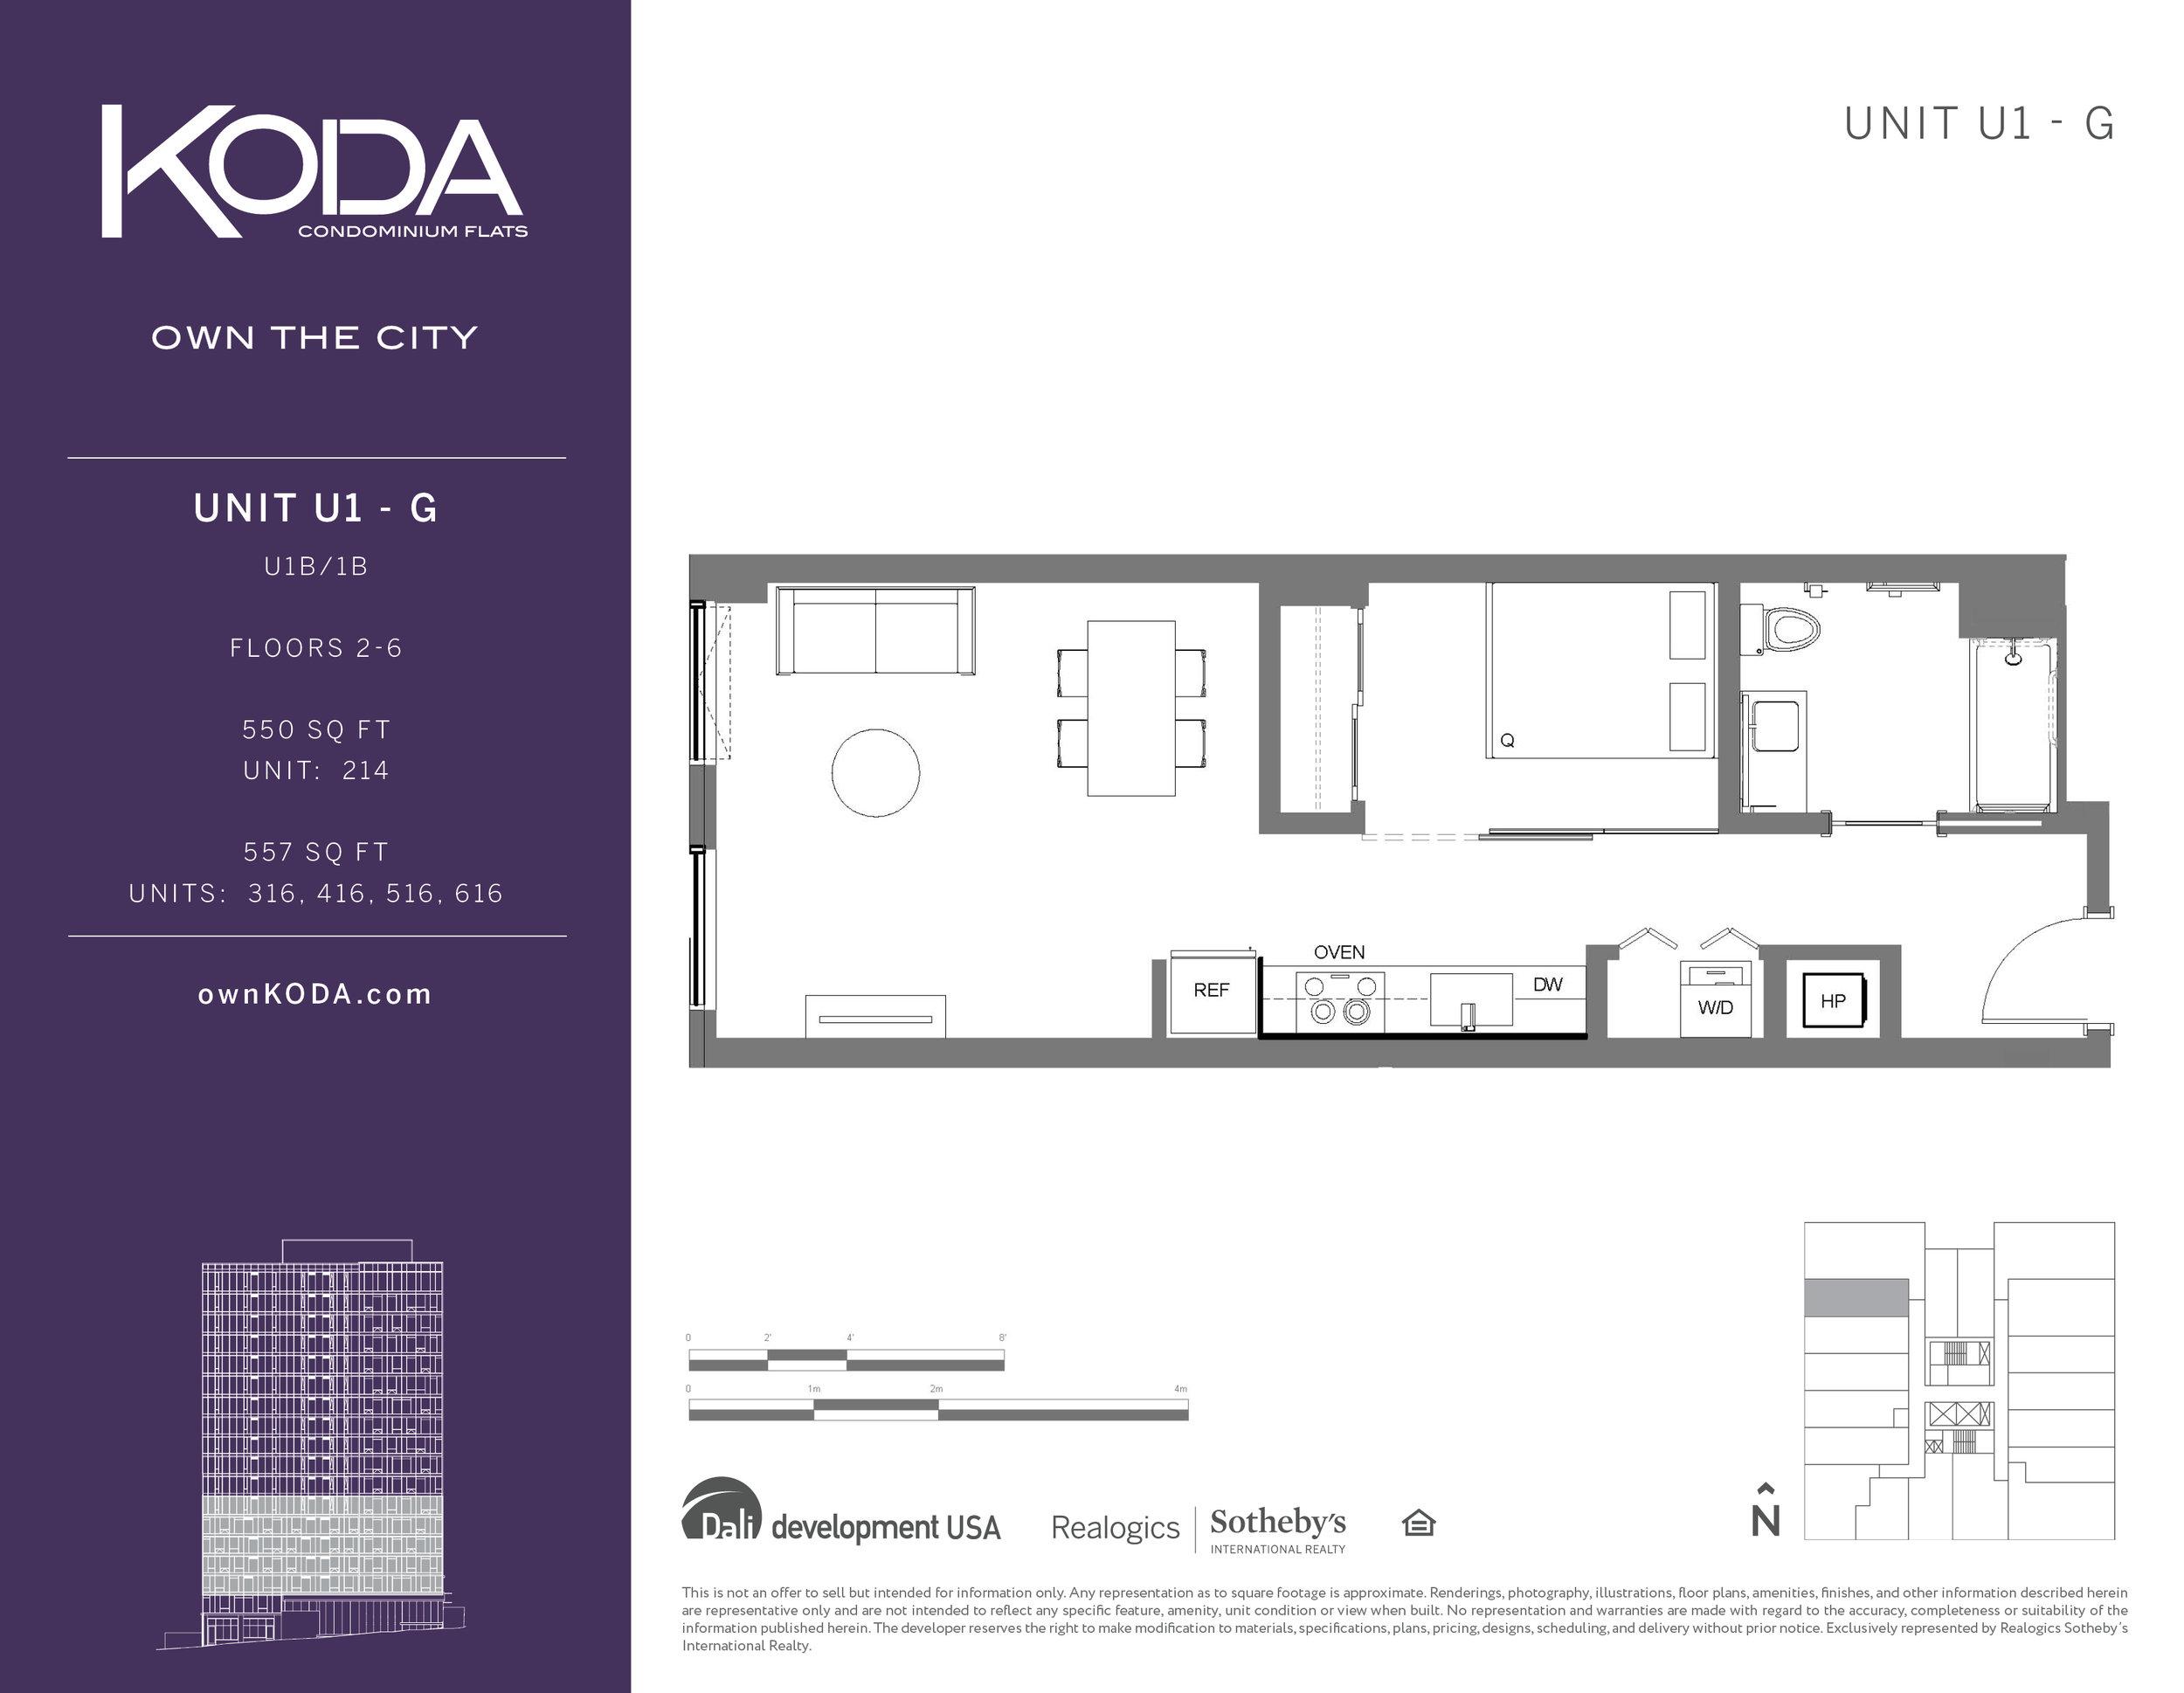 KODA_FloorPlanFlyer_Update_Approved_04.04.19_Release14.jpg